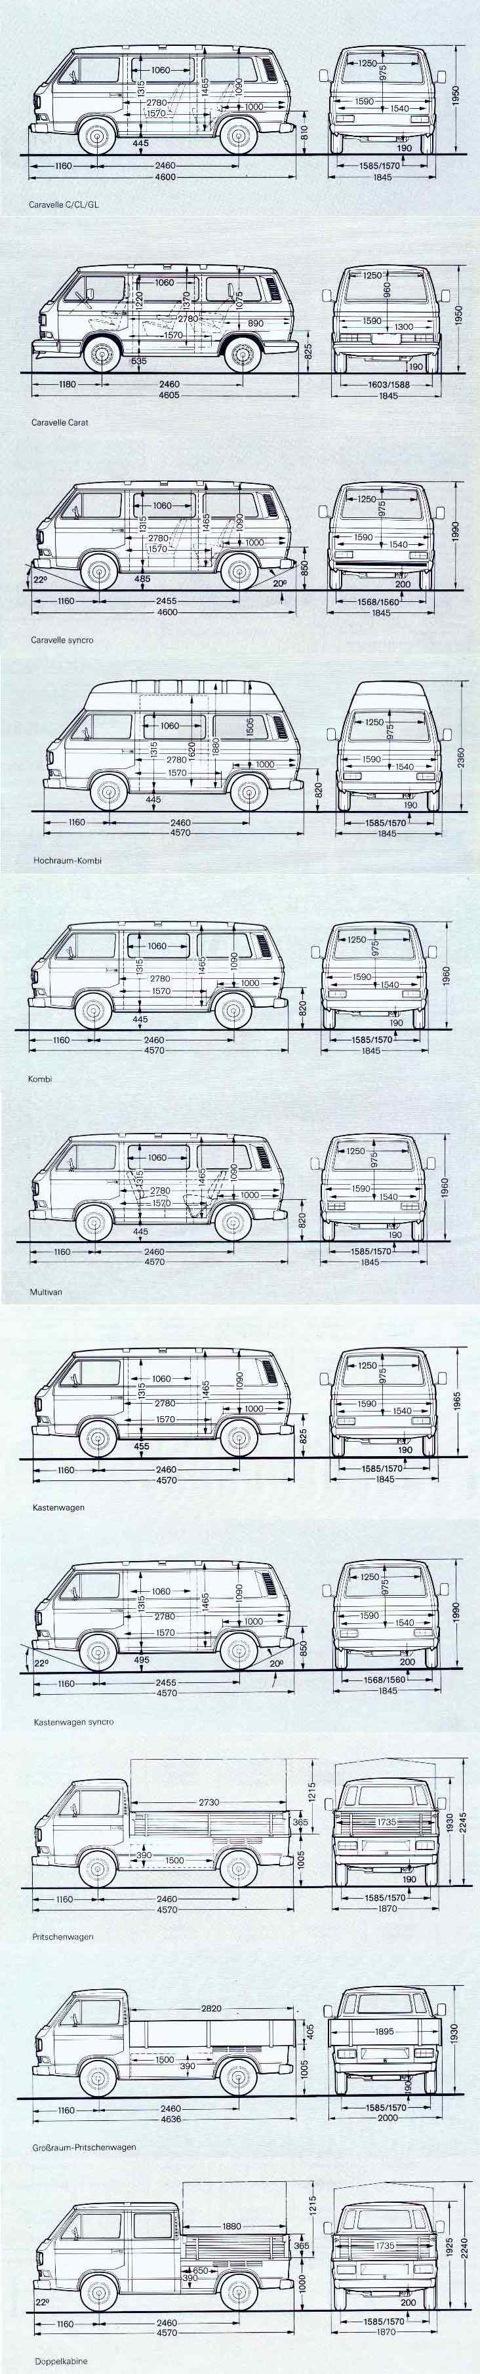 транспортер т3 габаритные размеры